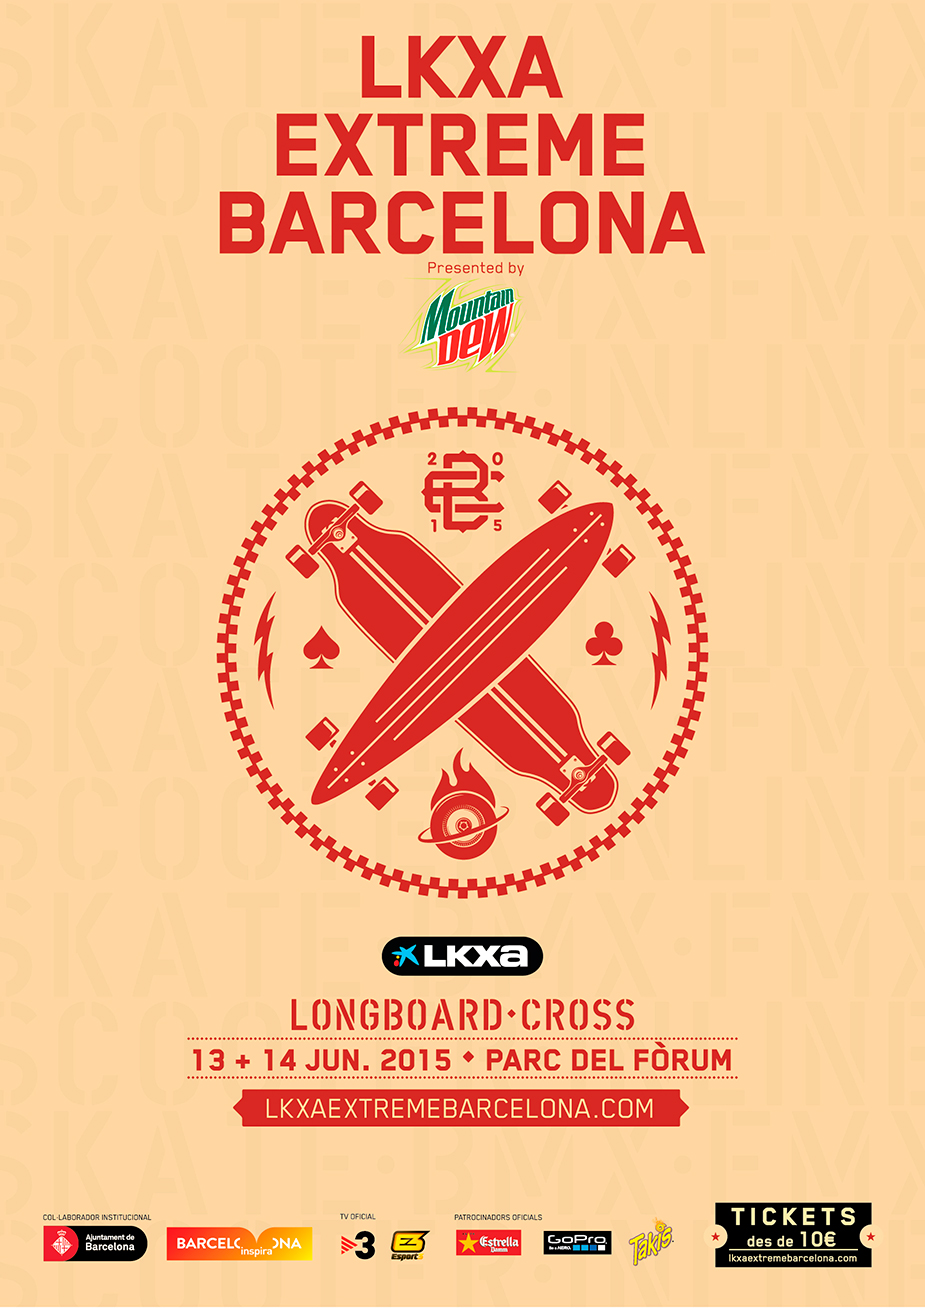 LKXA Extreme Barcelona Longboard Cross